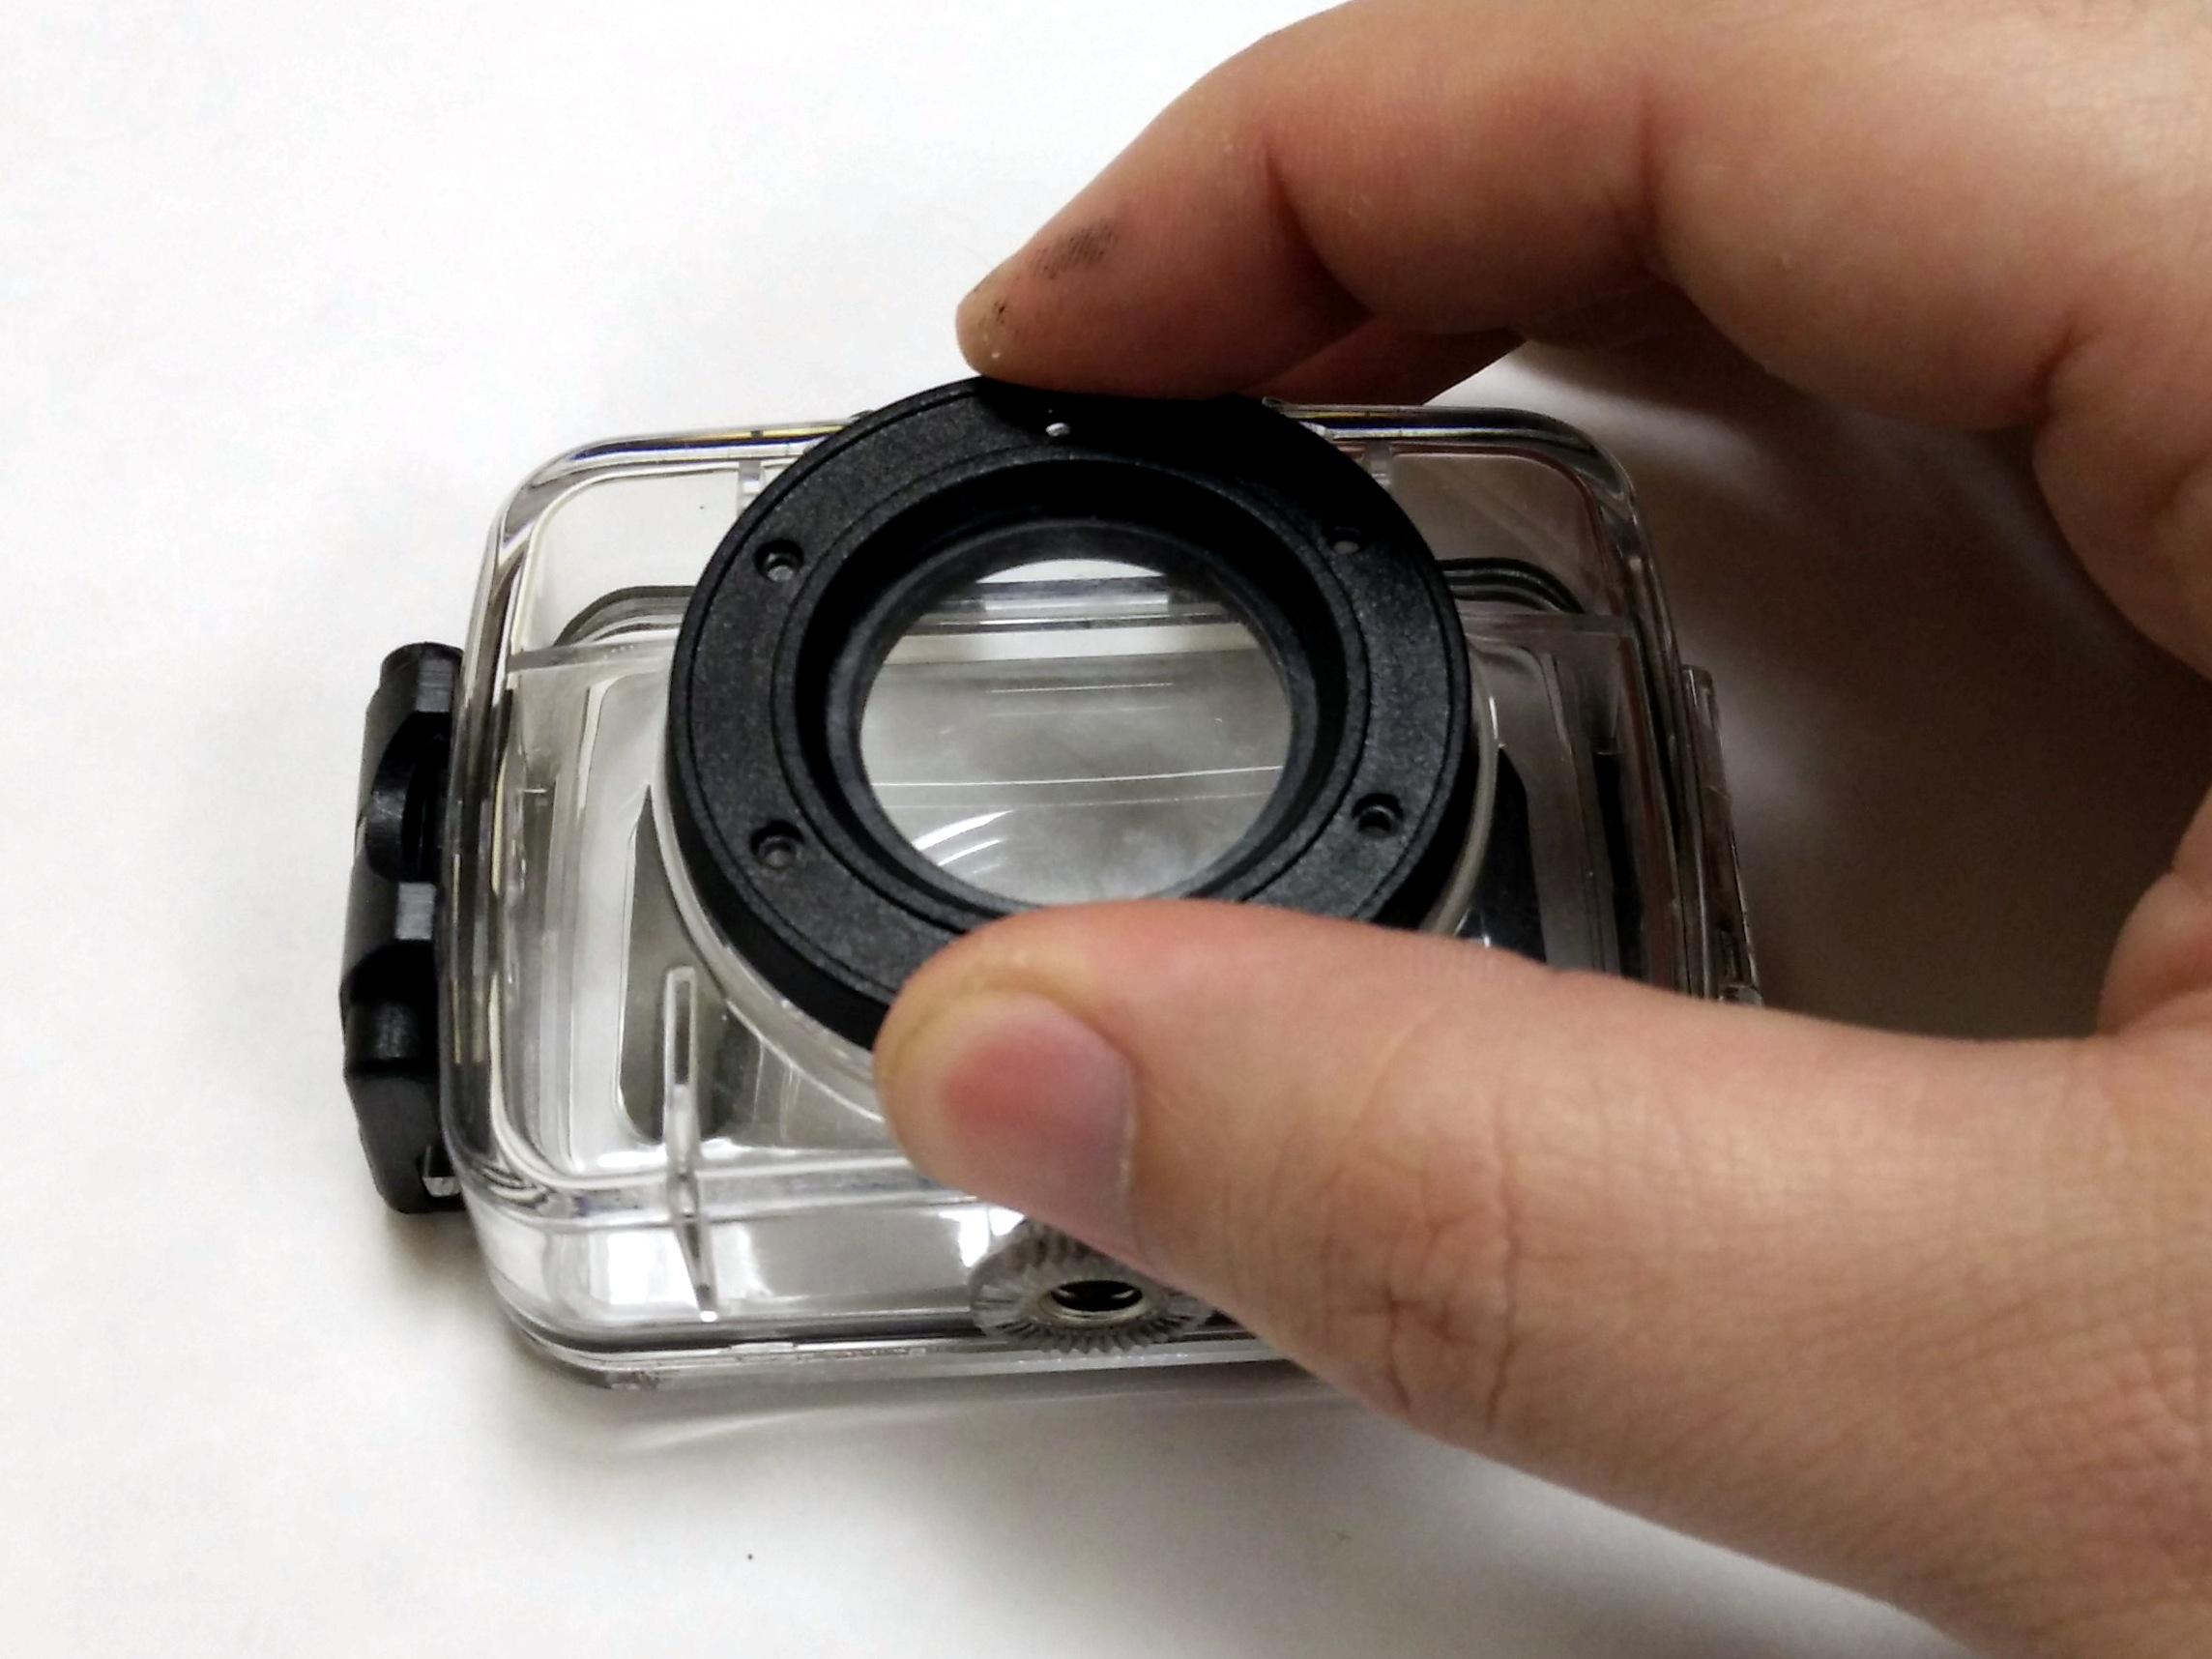 Vivitar Dvr 781hd Repair Ifixit Directv Genie Mini Wiring Diagram Waterproof Case Lens Cover